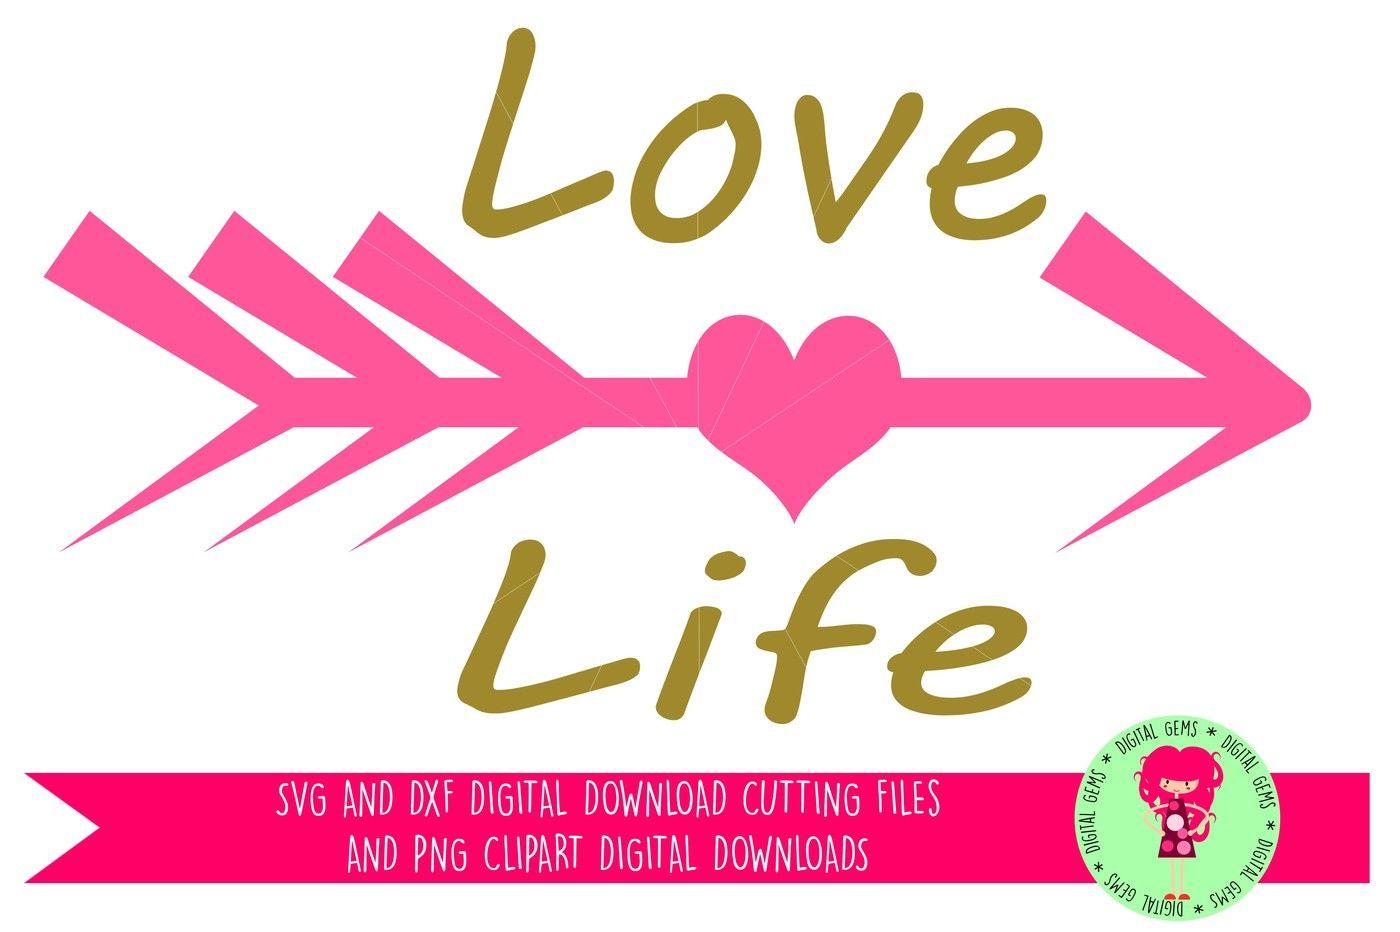 Love Life Svg Dxf Cutting Files By Digital Gems Thehungryjpeg Com